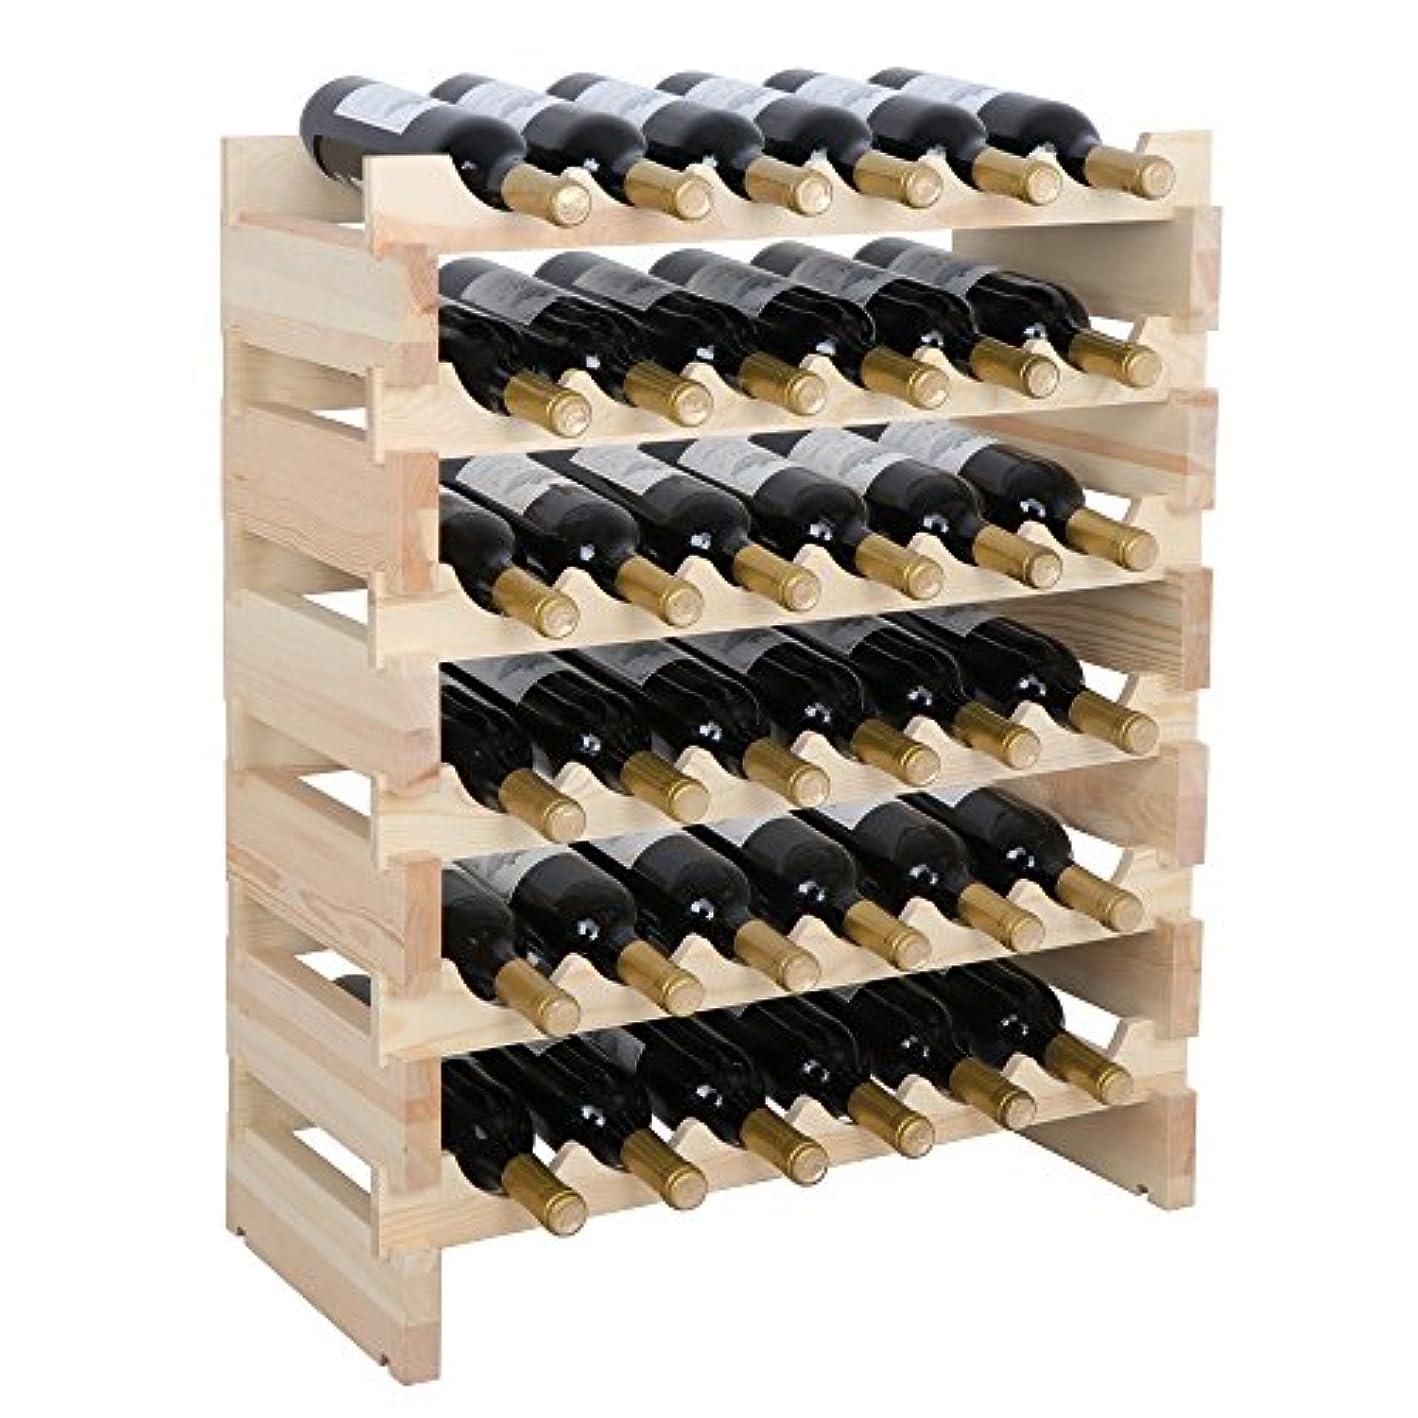 smartxchoice 36 Bottle Modular Wine Rack, Stackable Wine Storage Rack Free Standing Floor Wine Holder Display Shelves, Solid Wood - Wobble-Free (36 Bottles)